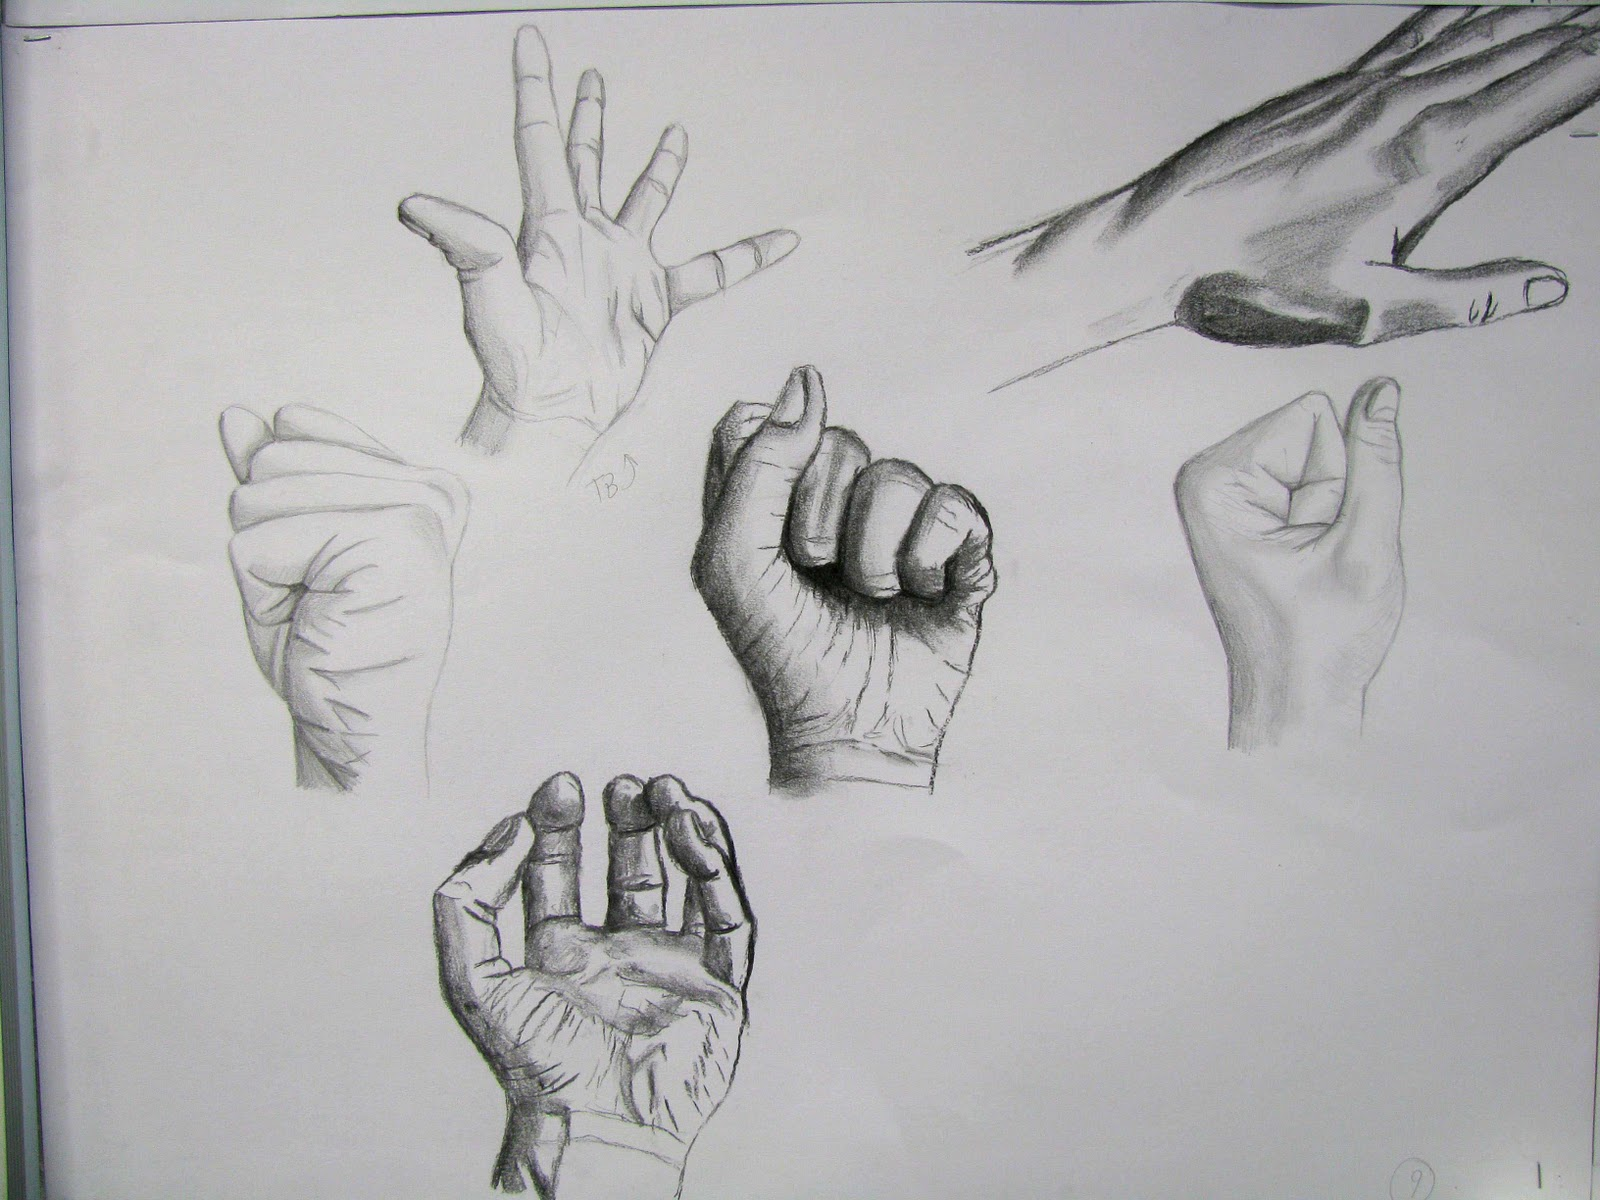 M naa caen croquis la main expressive - Dessin de la main ...